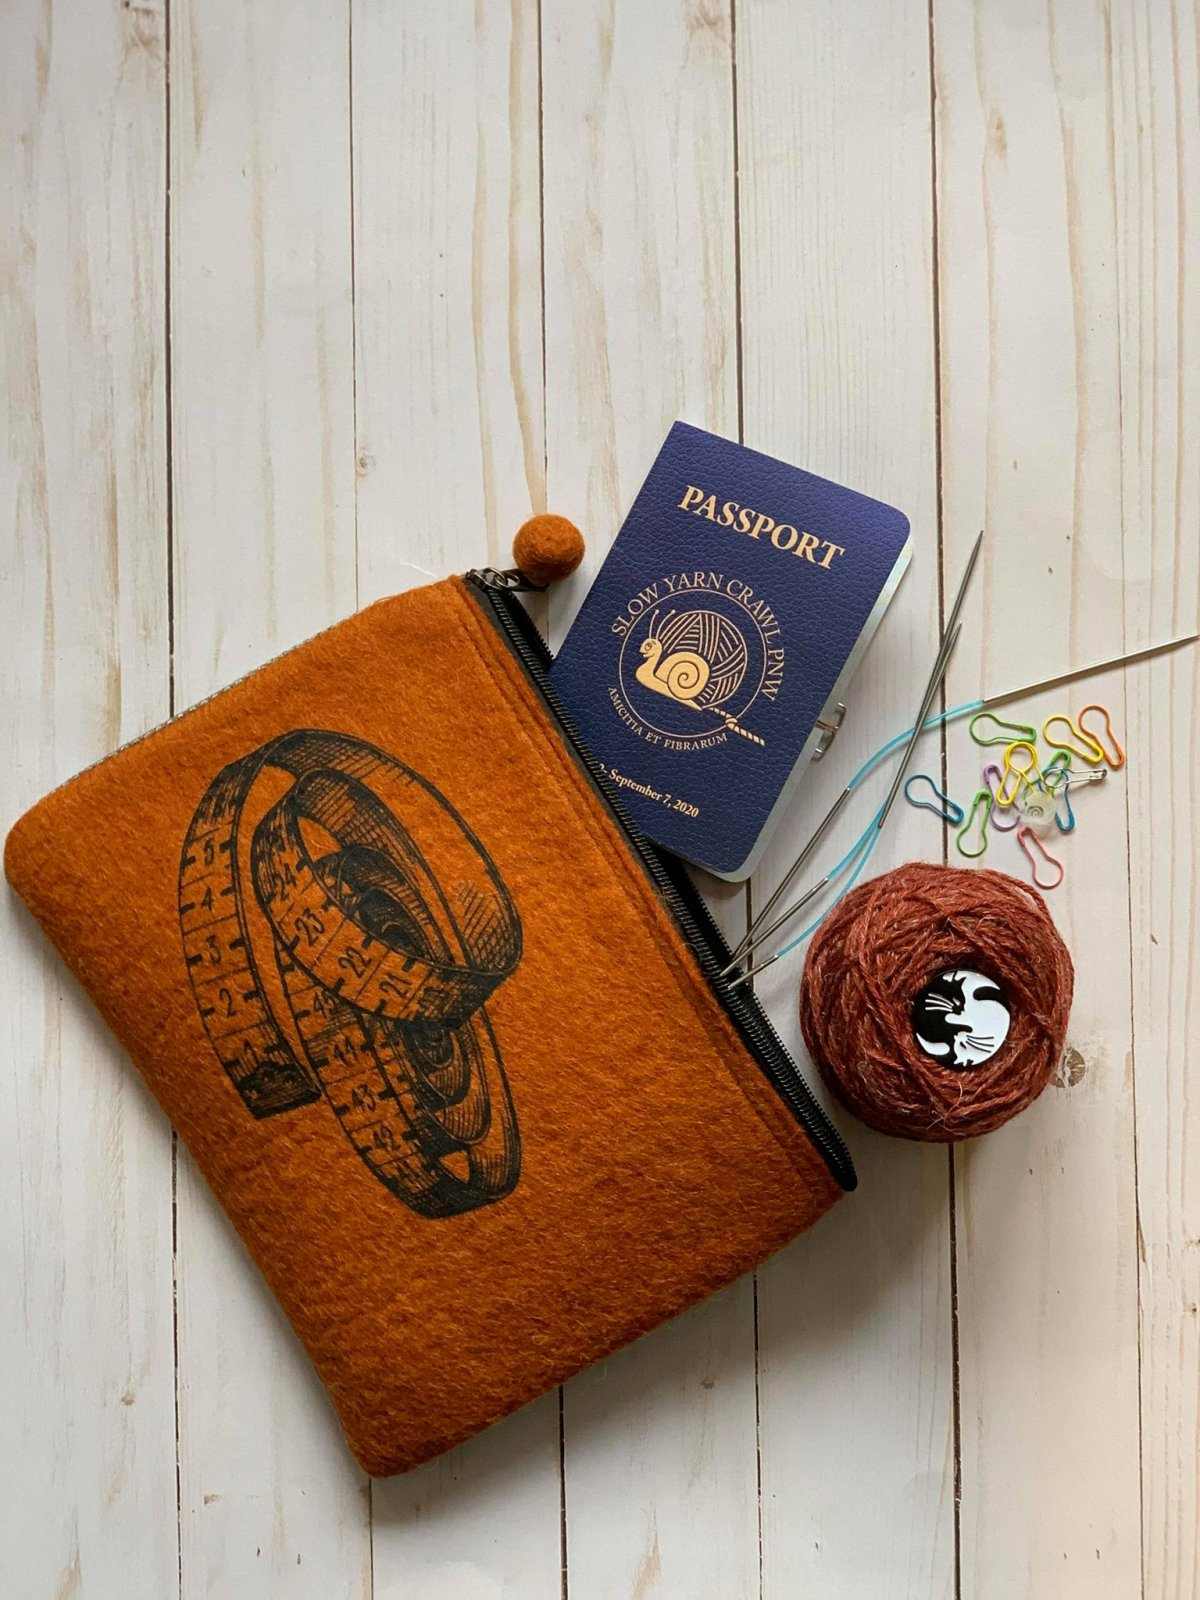 2020 Slow Yarn Crawl Passport